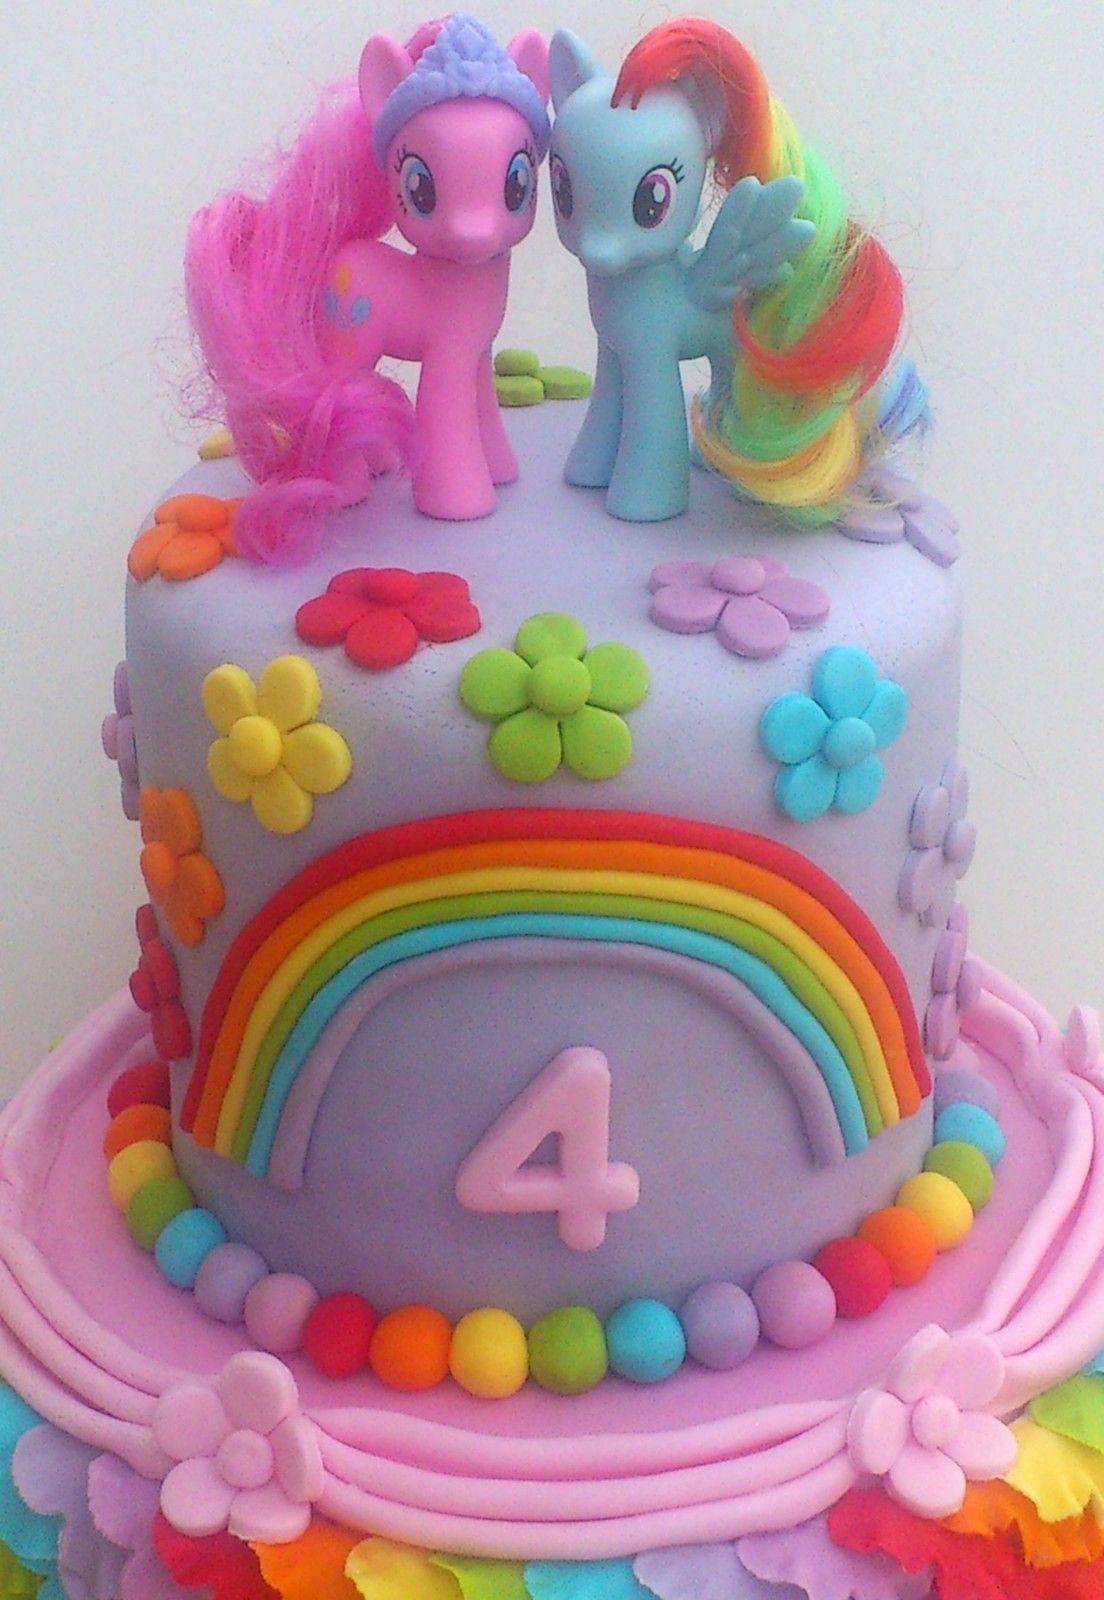 My Little Pony 2 Tier Rainbow Theme Novelty Birthday Cake With